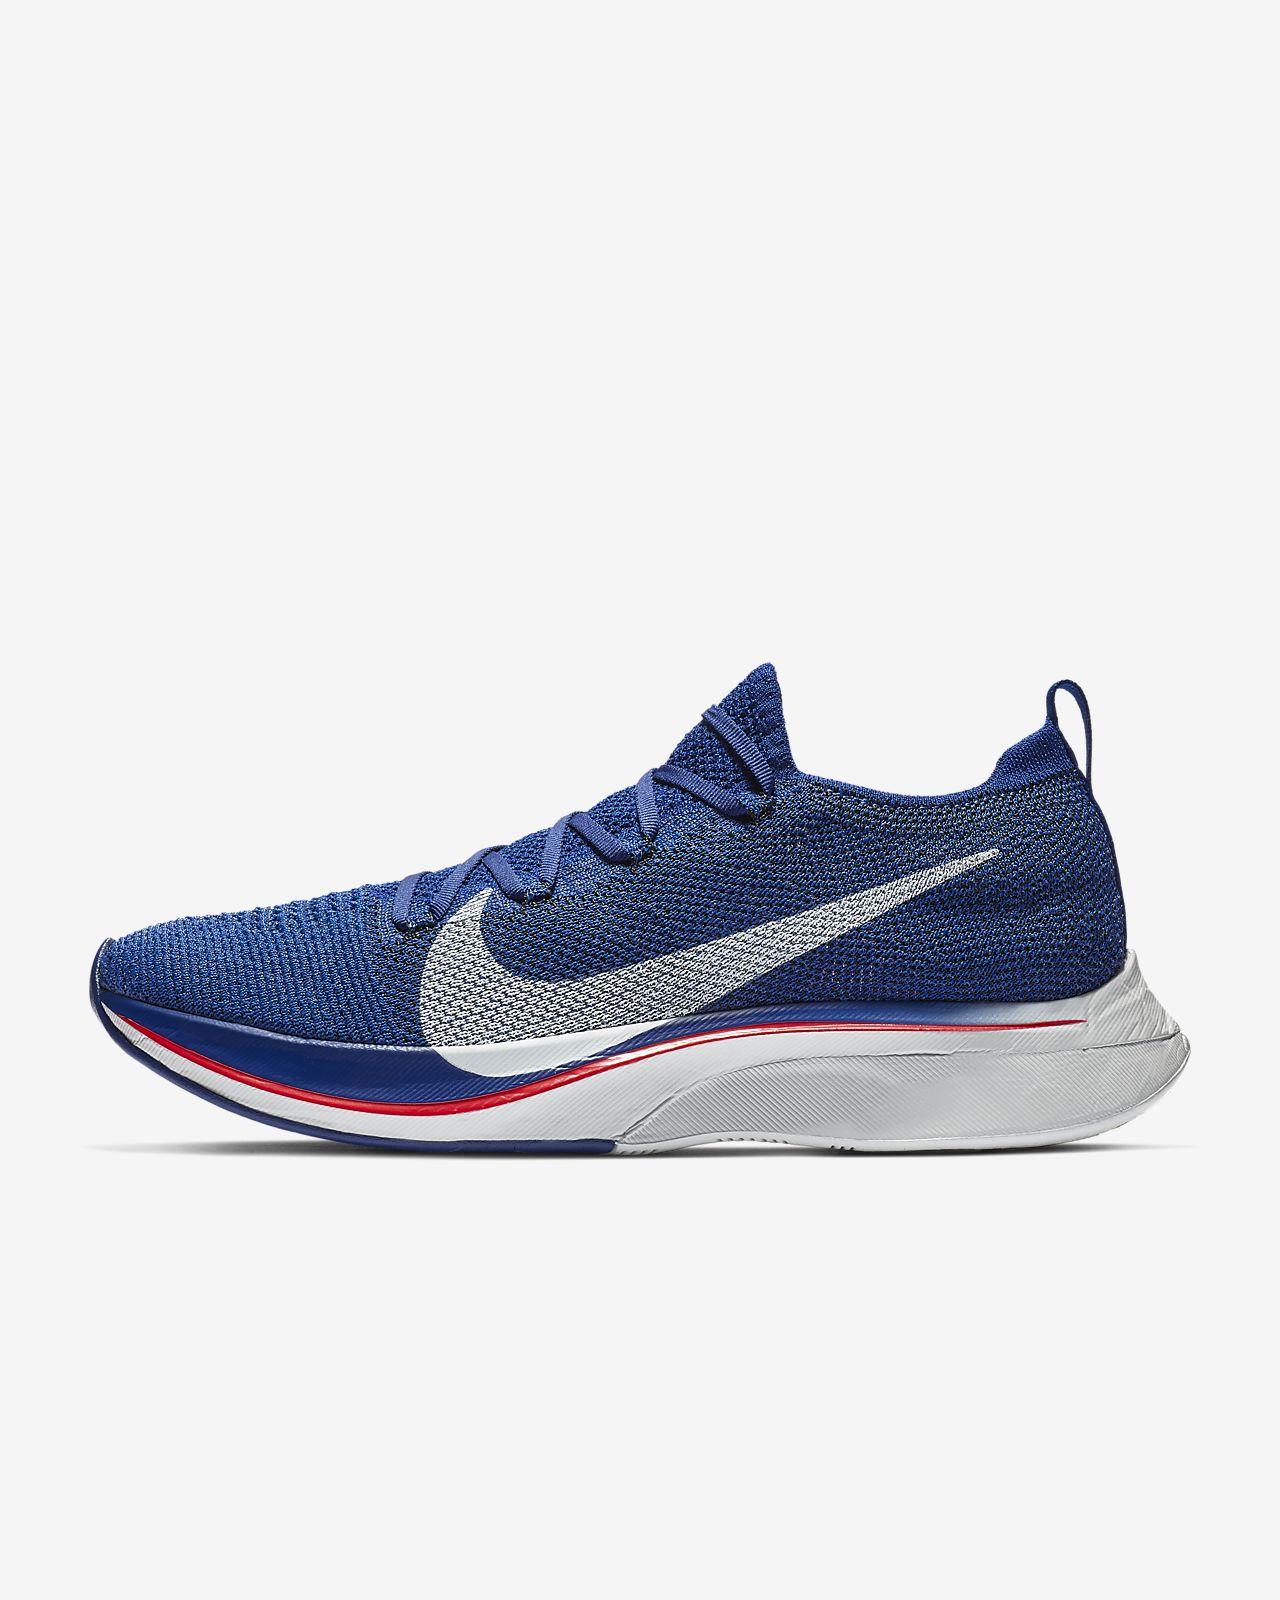 lowest price bfb0a 2fda7 Nike Vaporfly 4% Flyknit